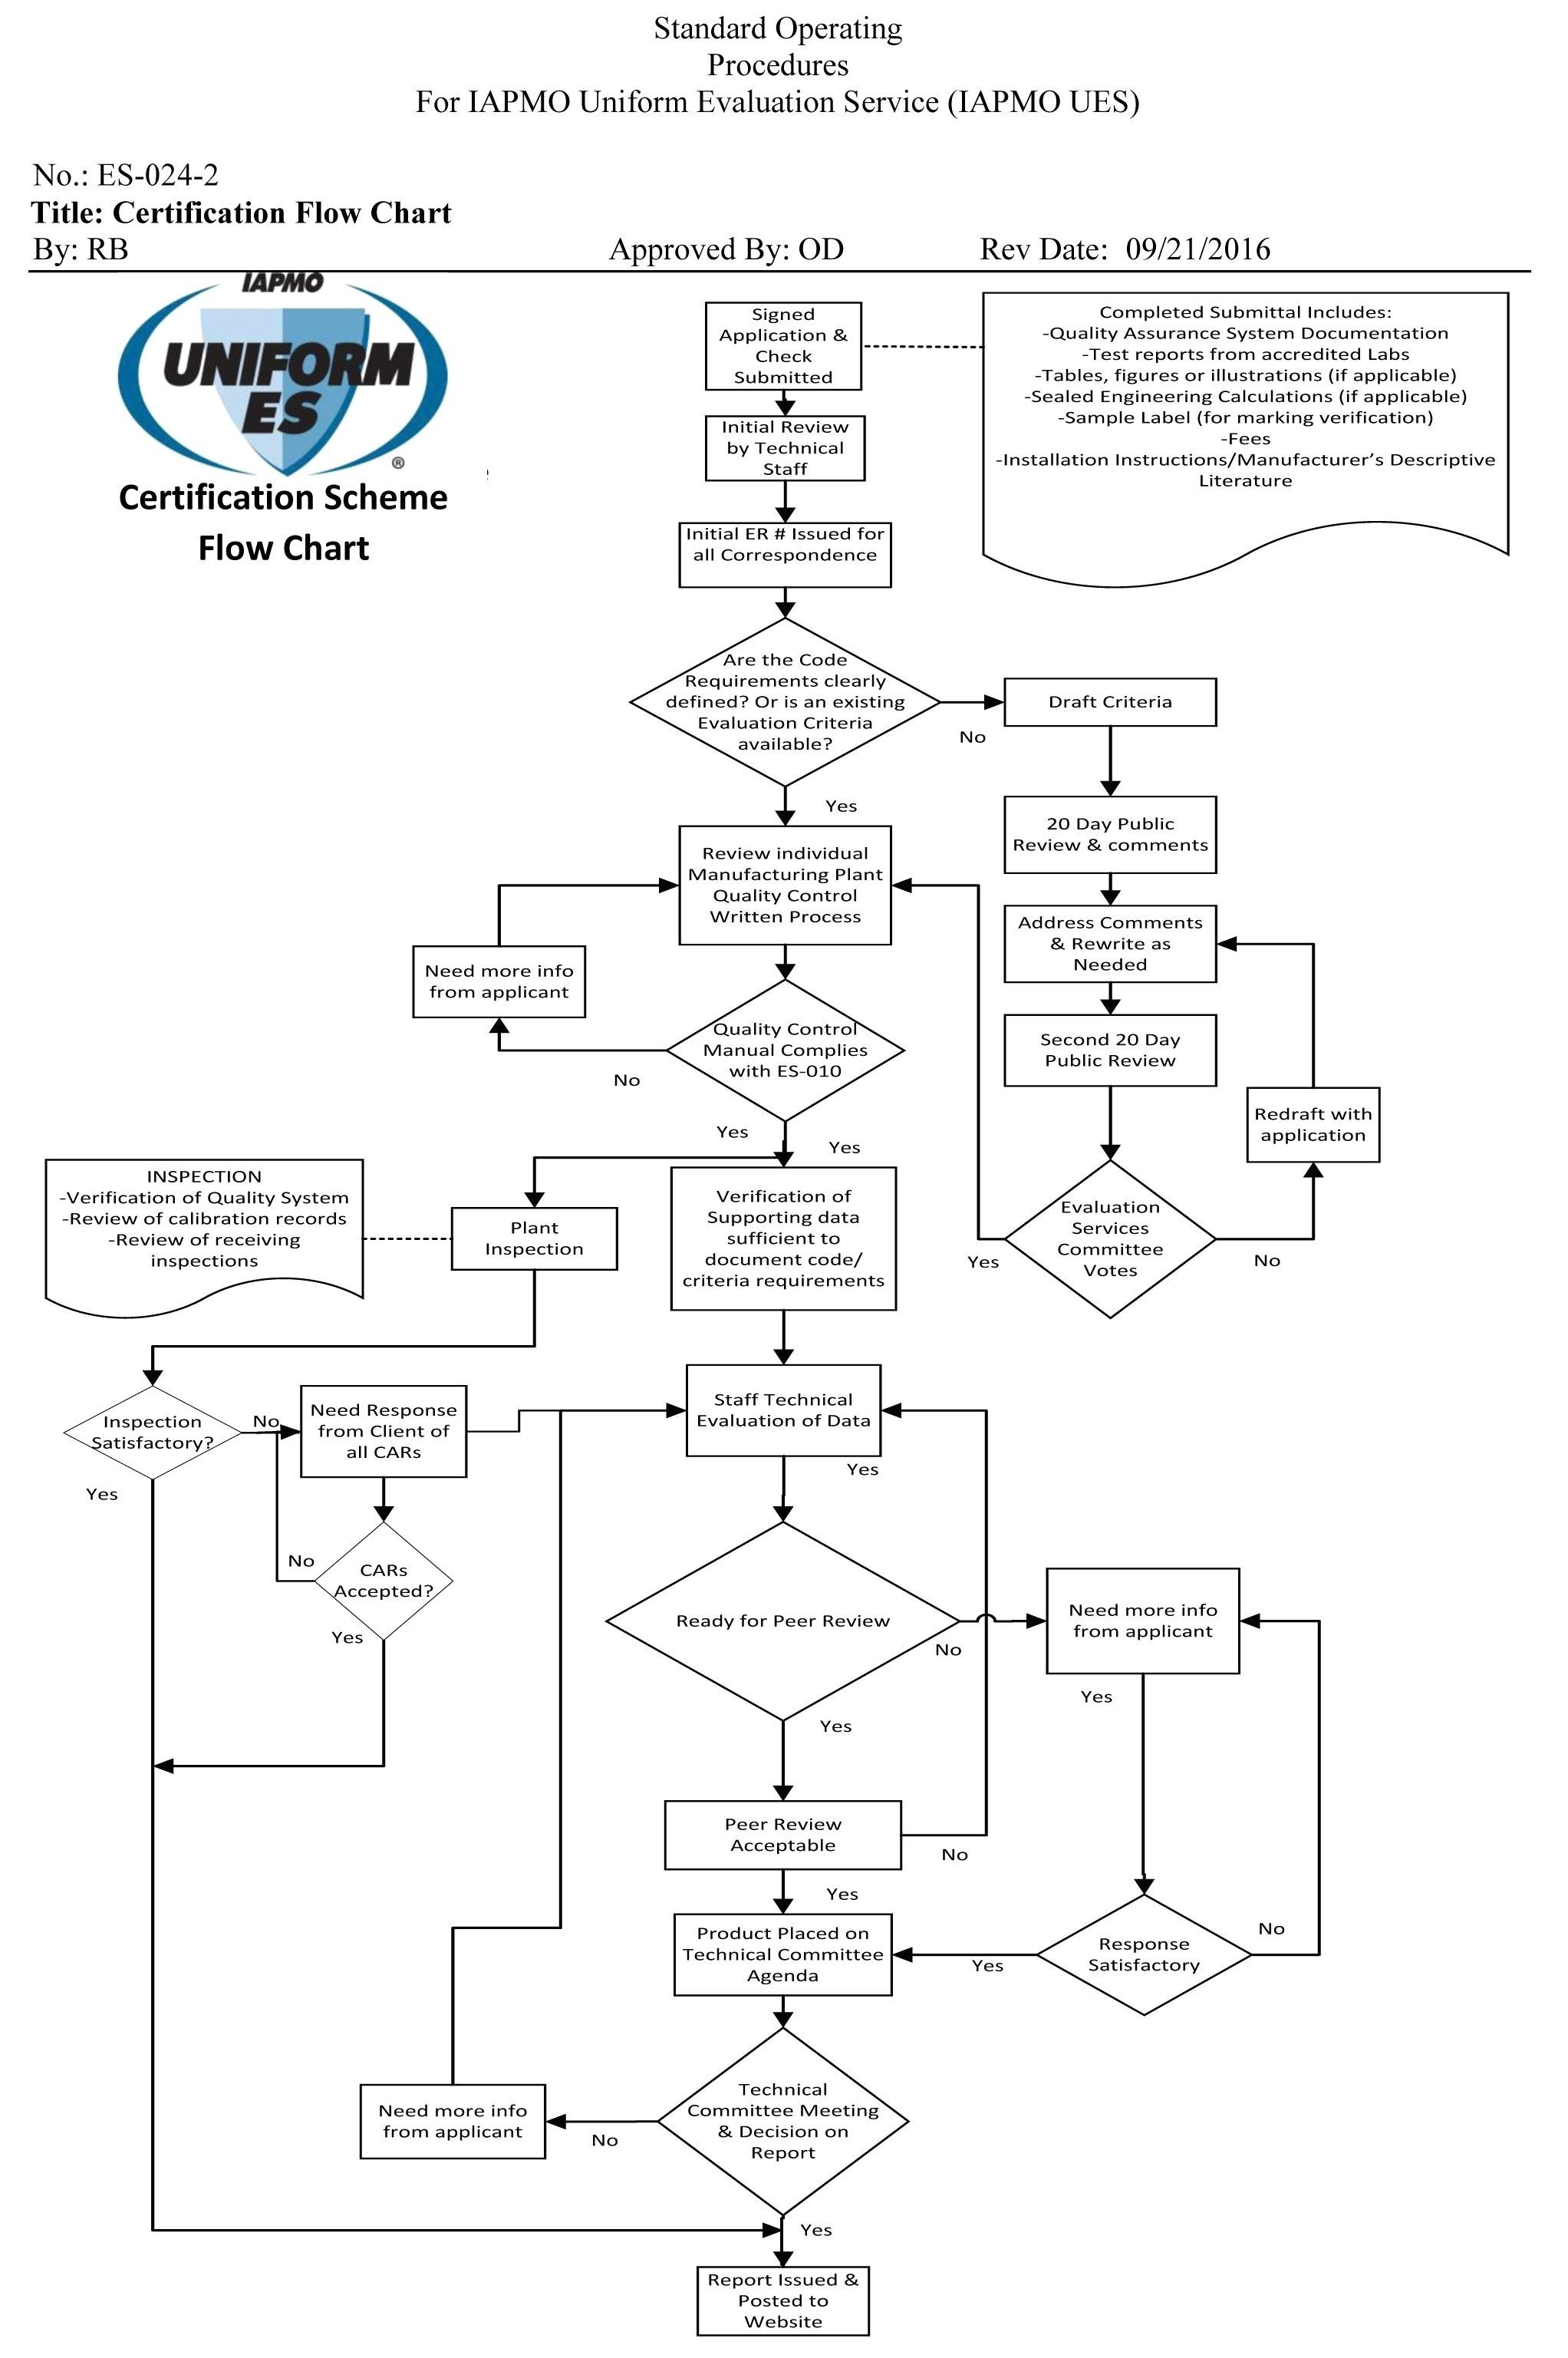 ge water heater wiring diagram free download wiring diagram img3 phase water heater thermostat wiring diagram